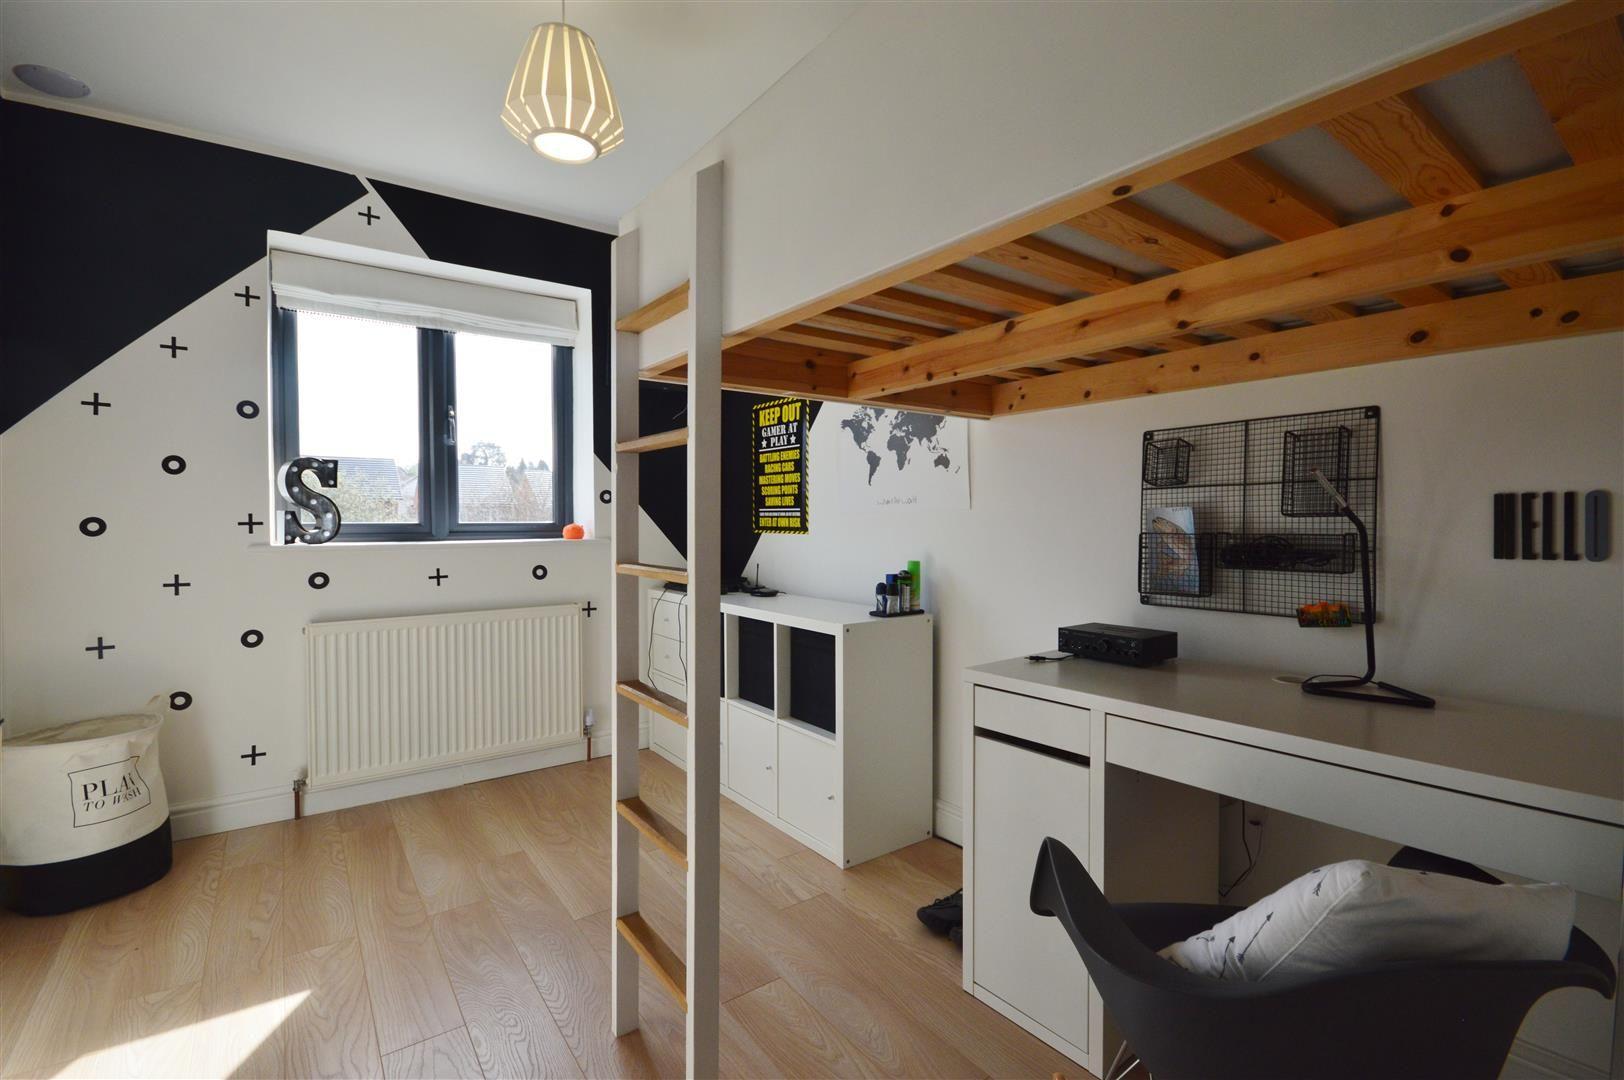 5 bed detached for sale in Leominster 13